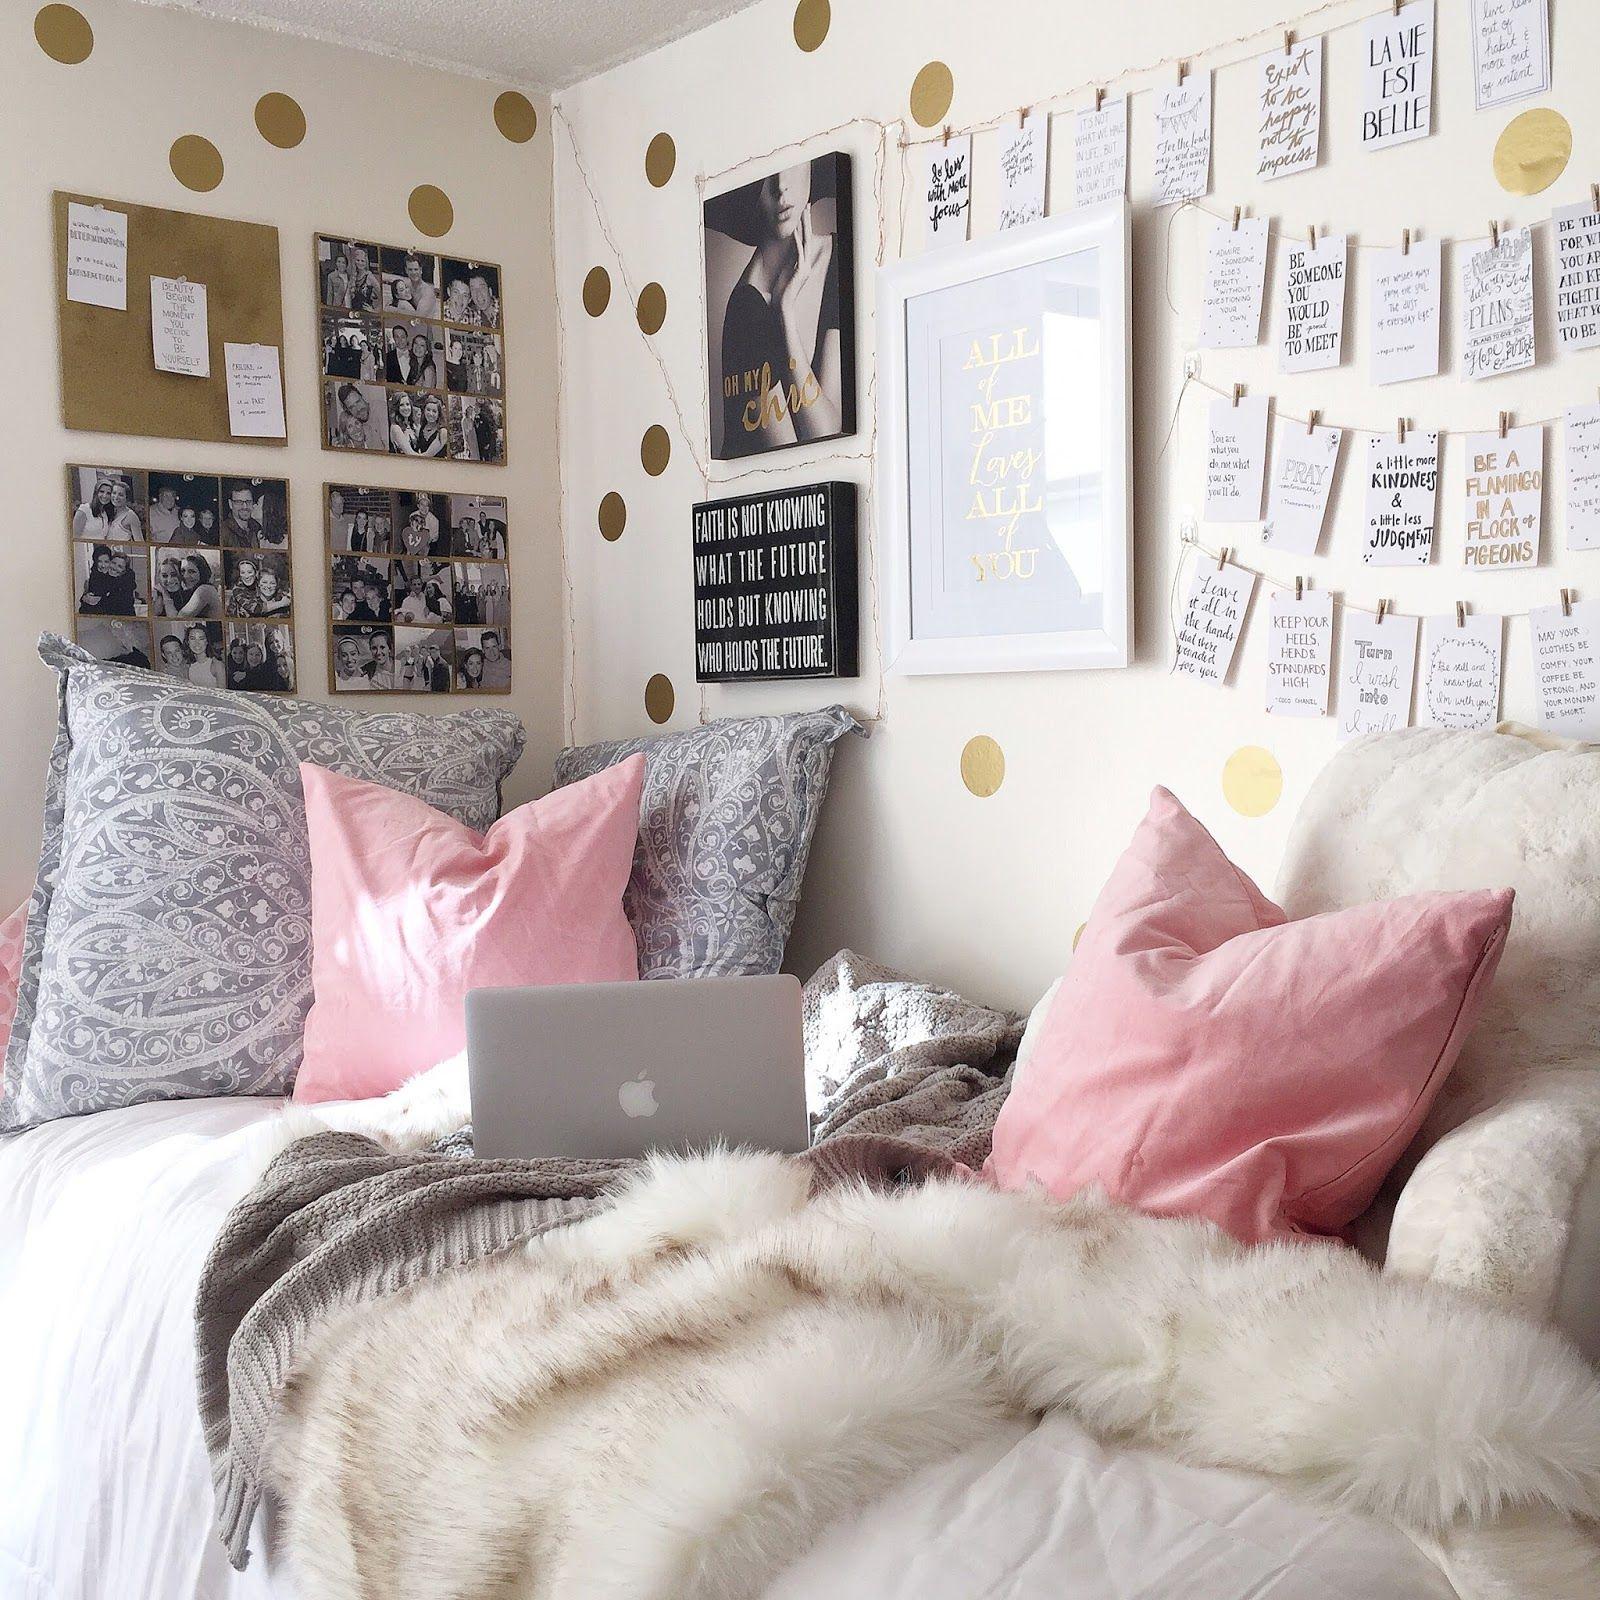 Pretty Dorm Room   B   W photos on corkboard above bed  gold polka dot. Pretty Dorm Room   B   W photos on corkboard above bed  gold polka